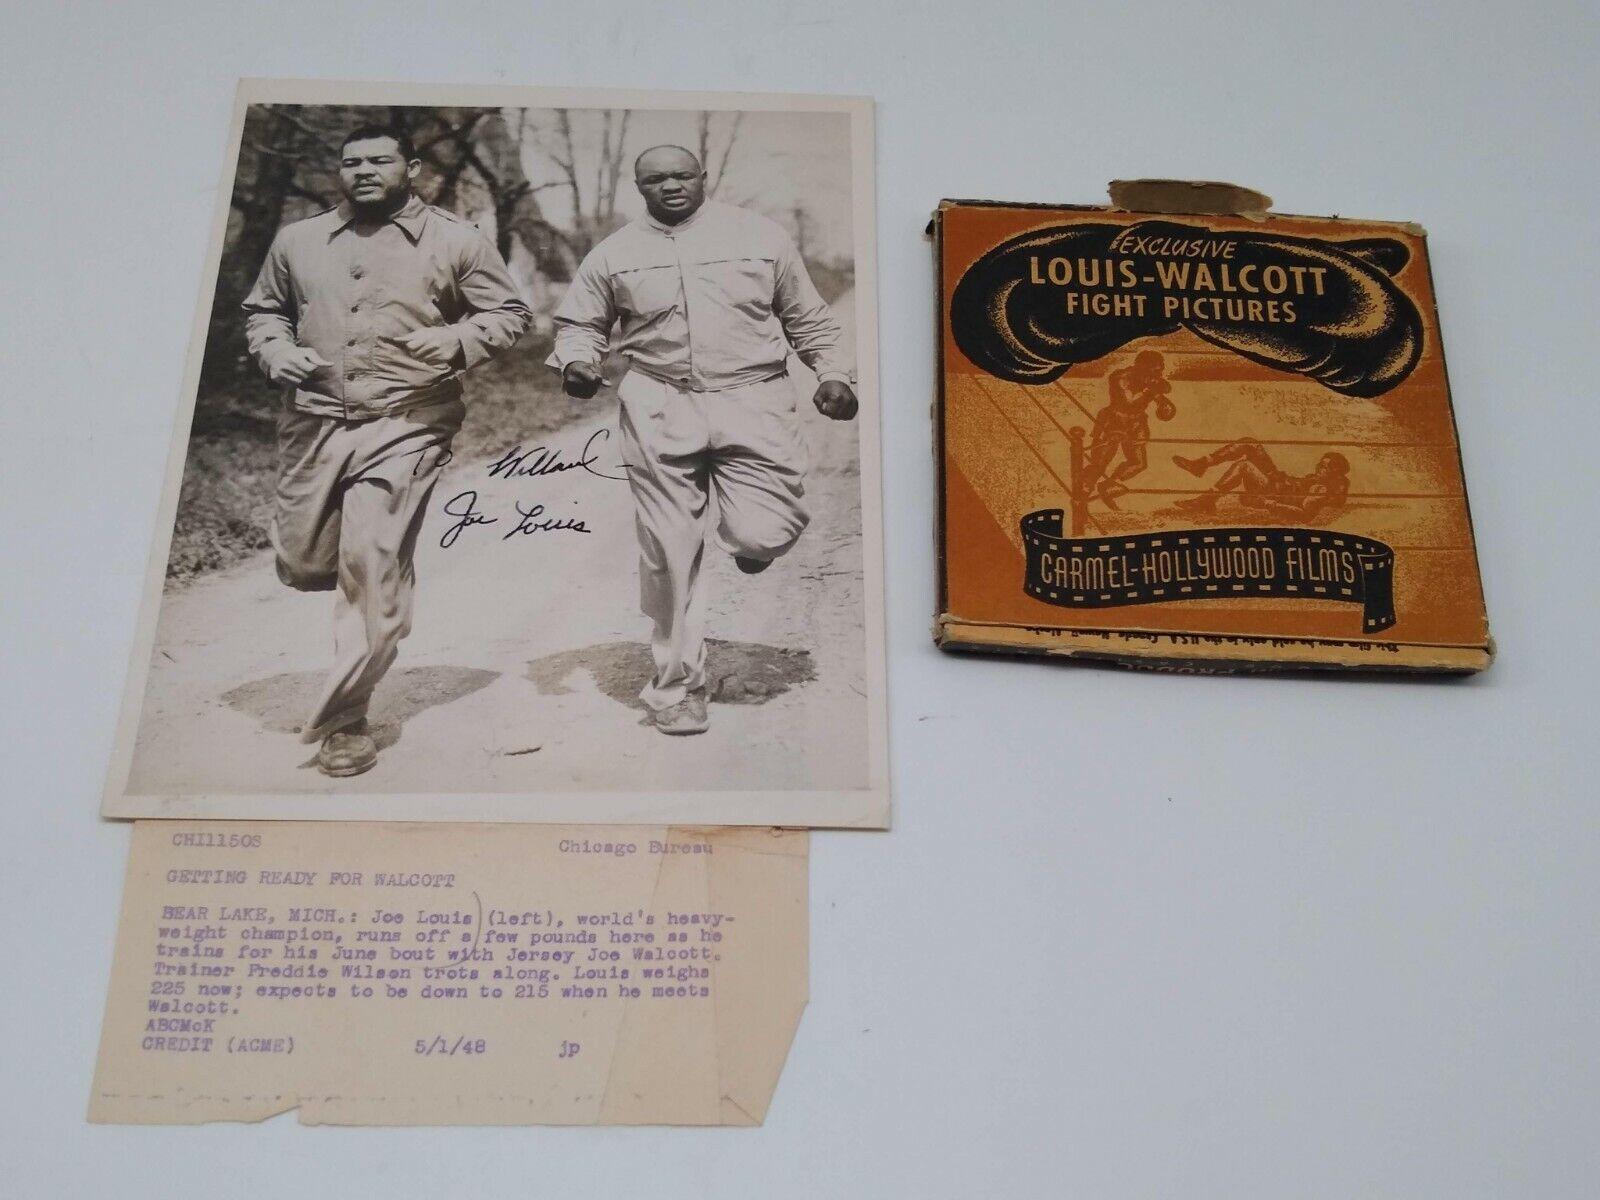 World Heavy Weight Champion Joe Louis Autograph Photo and Walcott Fight Film